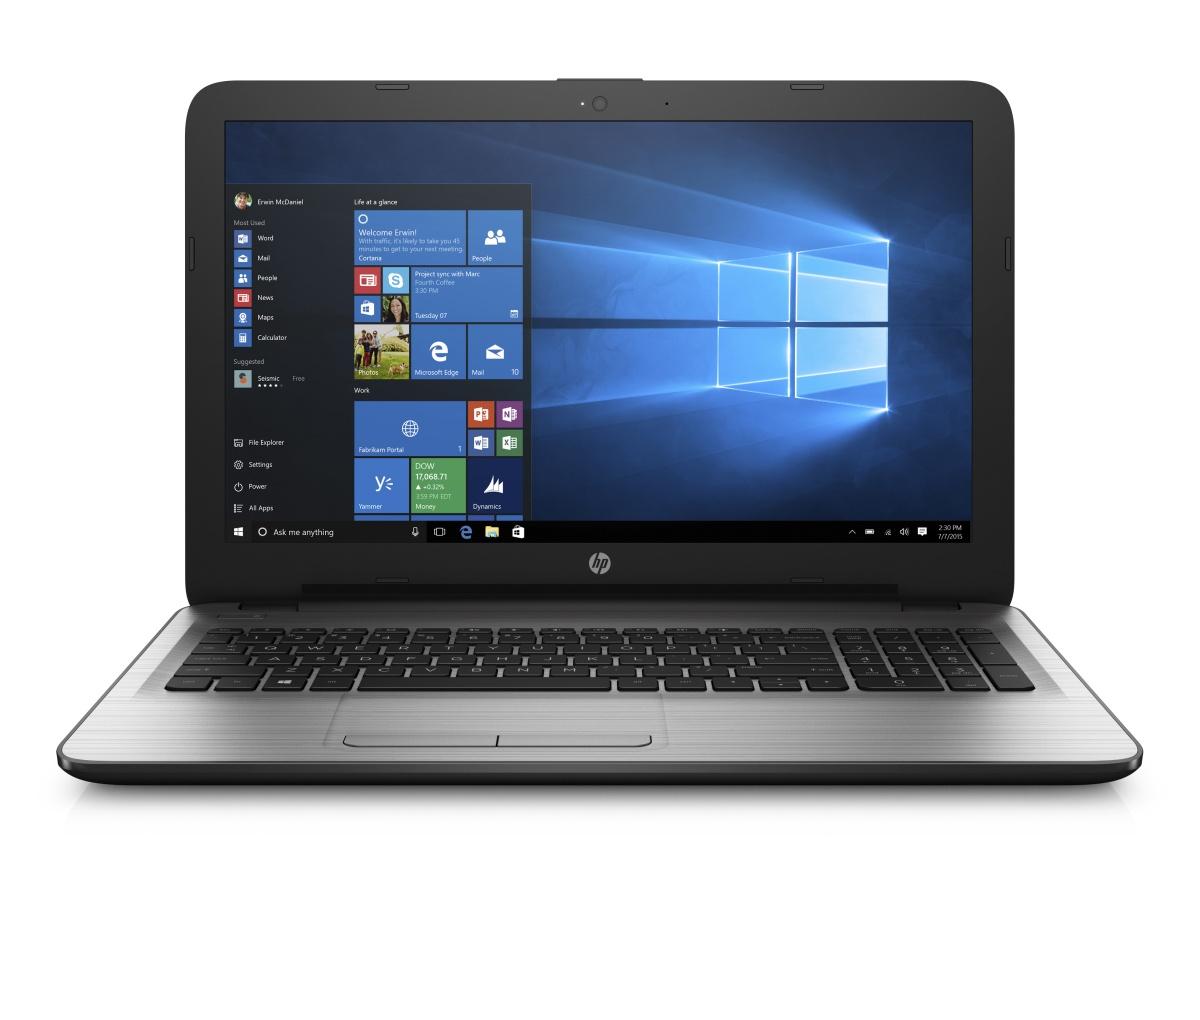 "HP 250 G5 15.6"" FHD/i3-5005U/4GB/1TB/DVD/HDMI/VGA/RJ45/WIFI/BT/MCR/1RServis/W10"